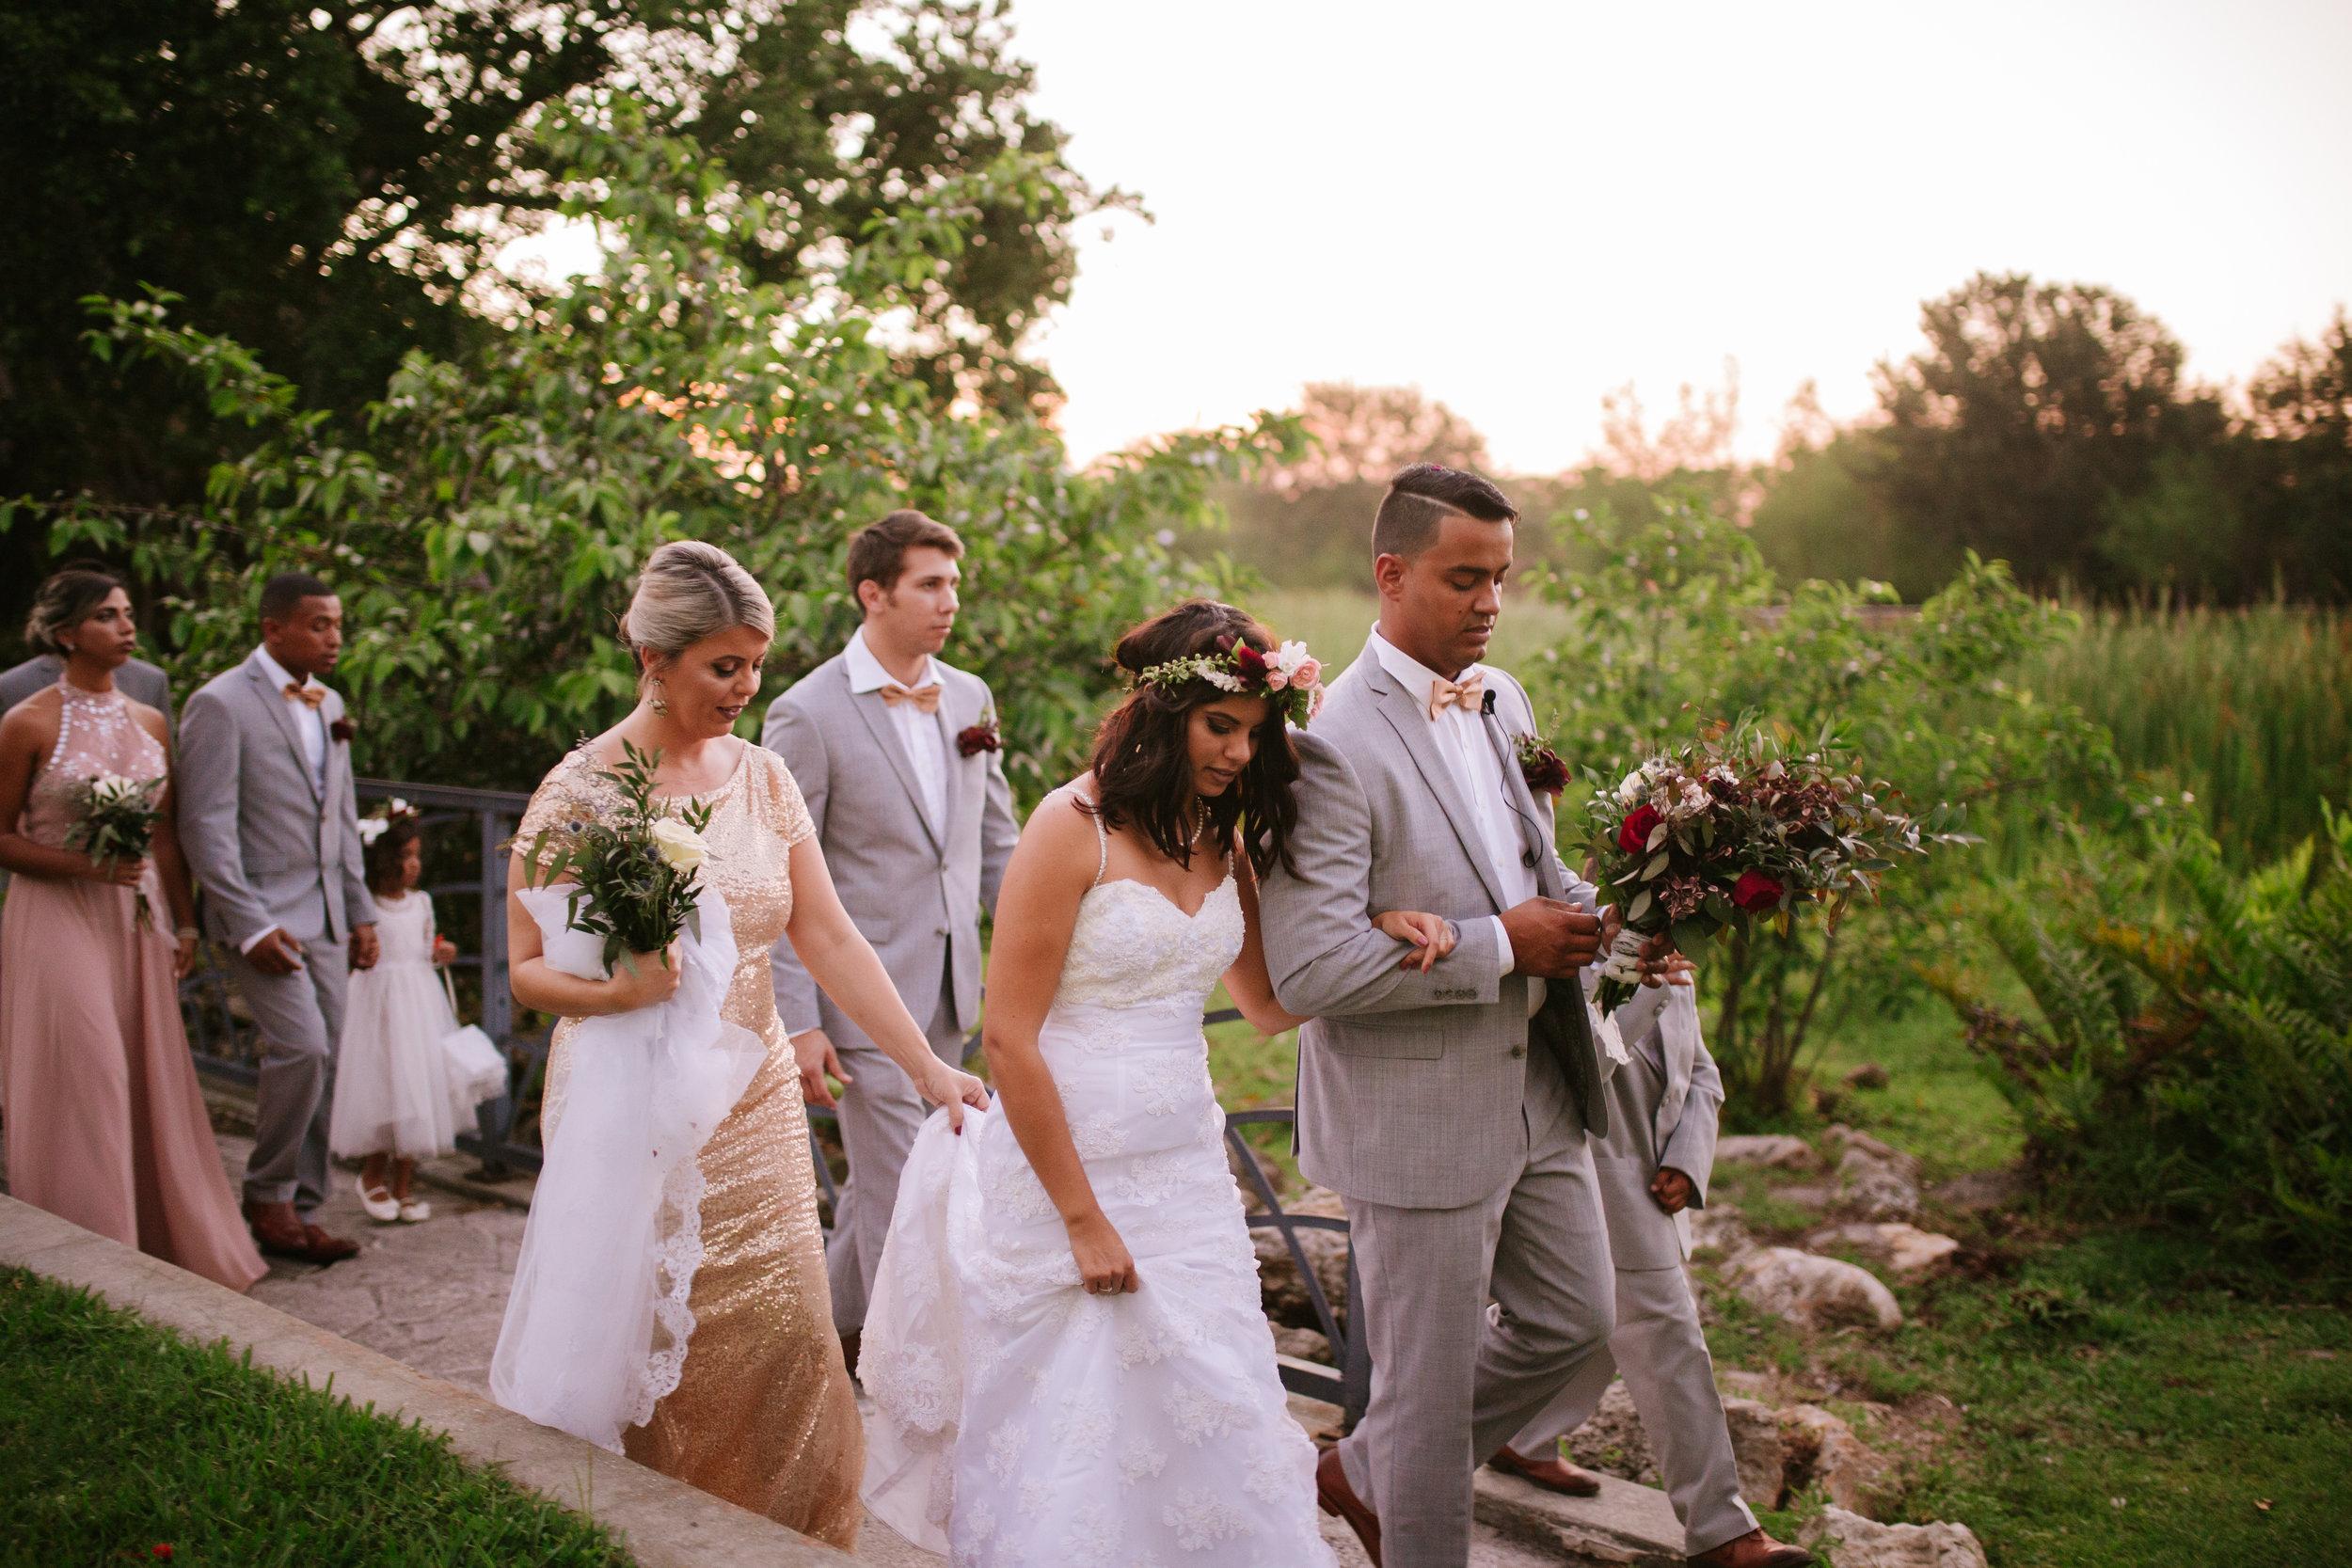 2017.05.23 Barbara and Mauricio Sales Port St Lucie Wedding (467 of 772).jpg